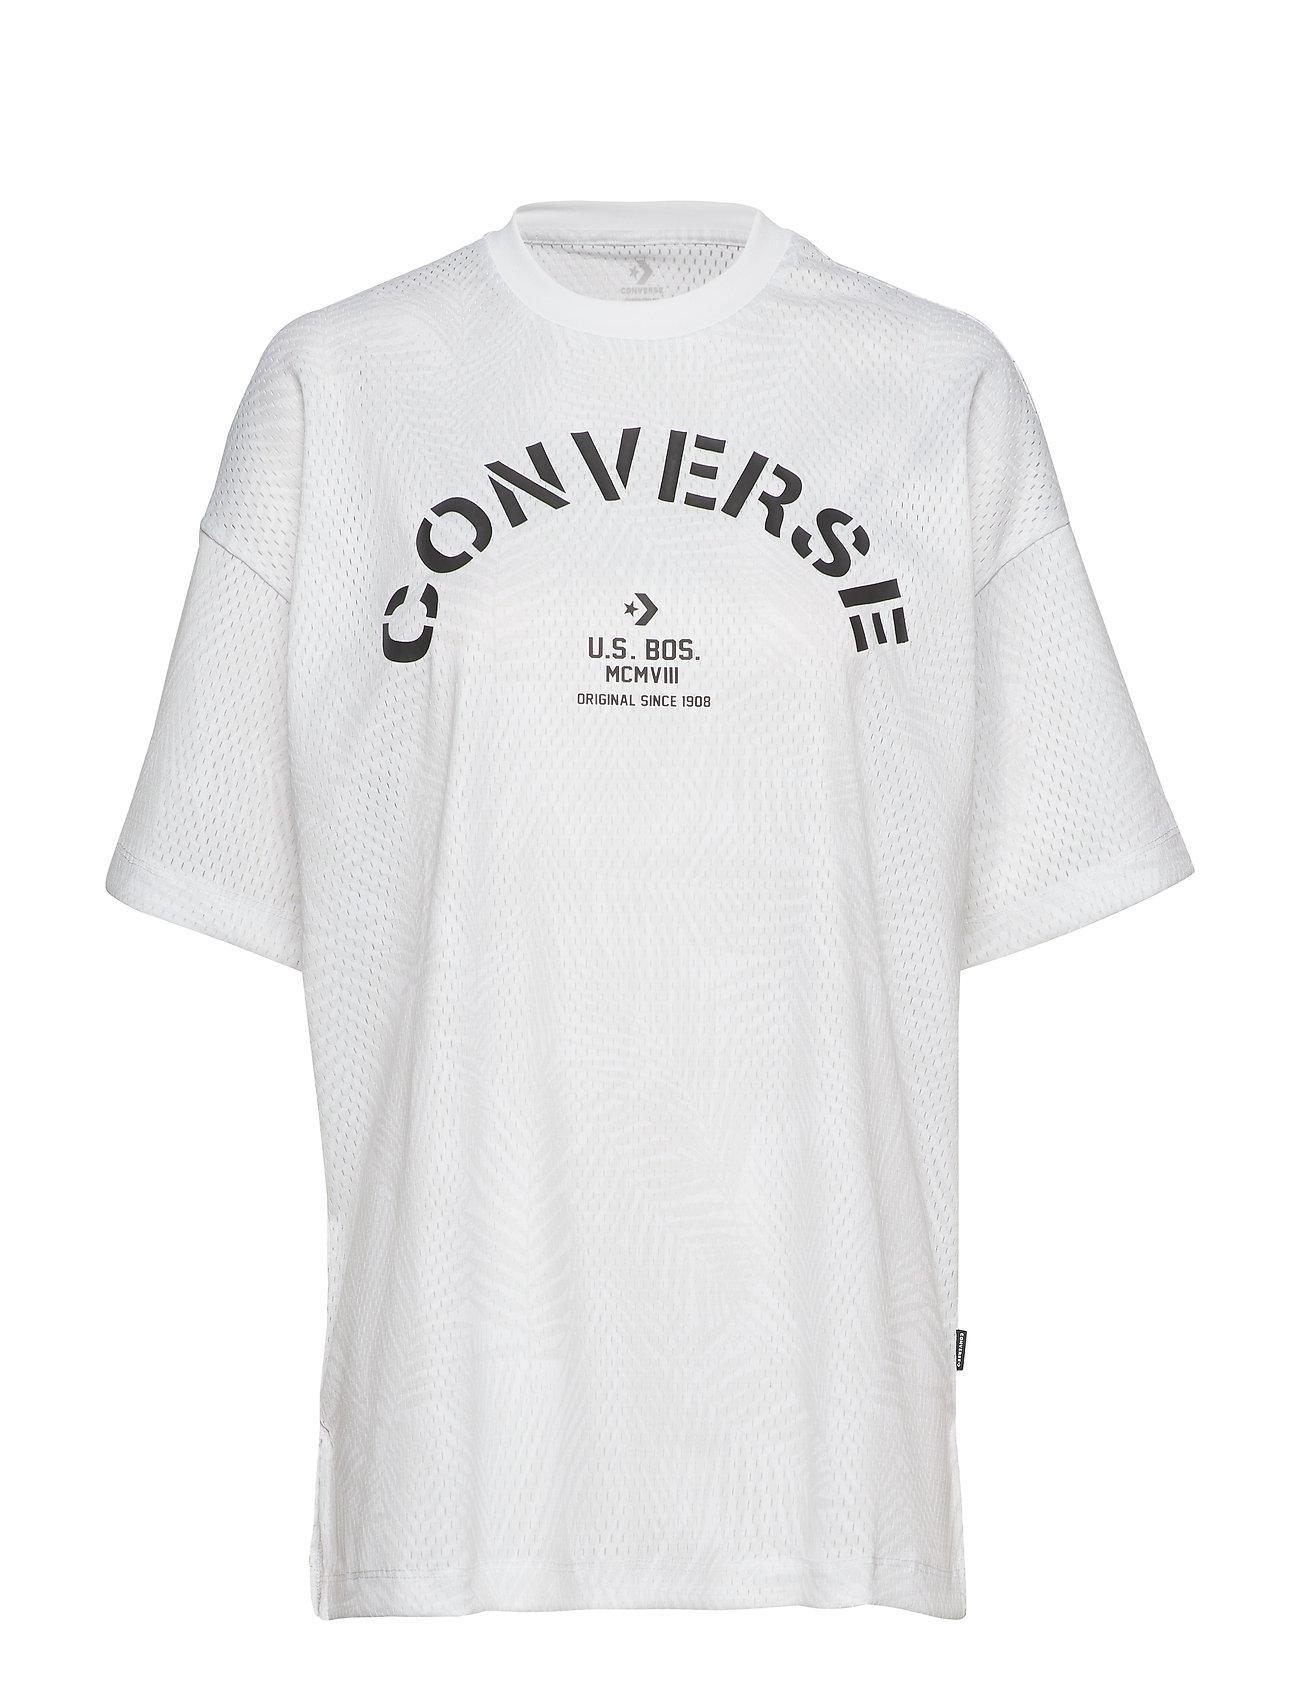 Converse Converse Areca Palm Mesh Boxy Tee - WHITE